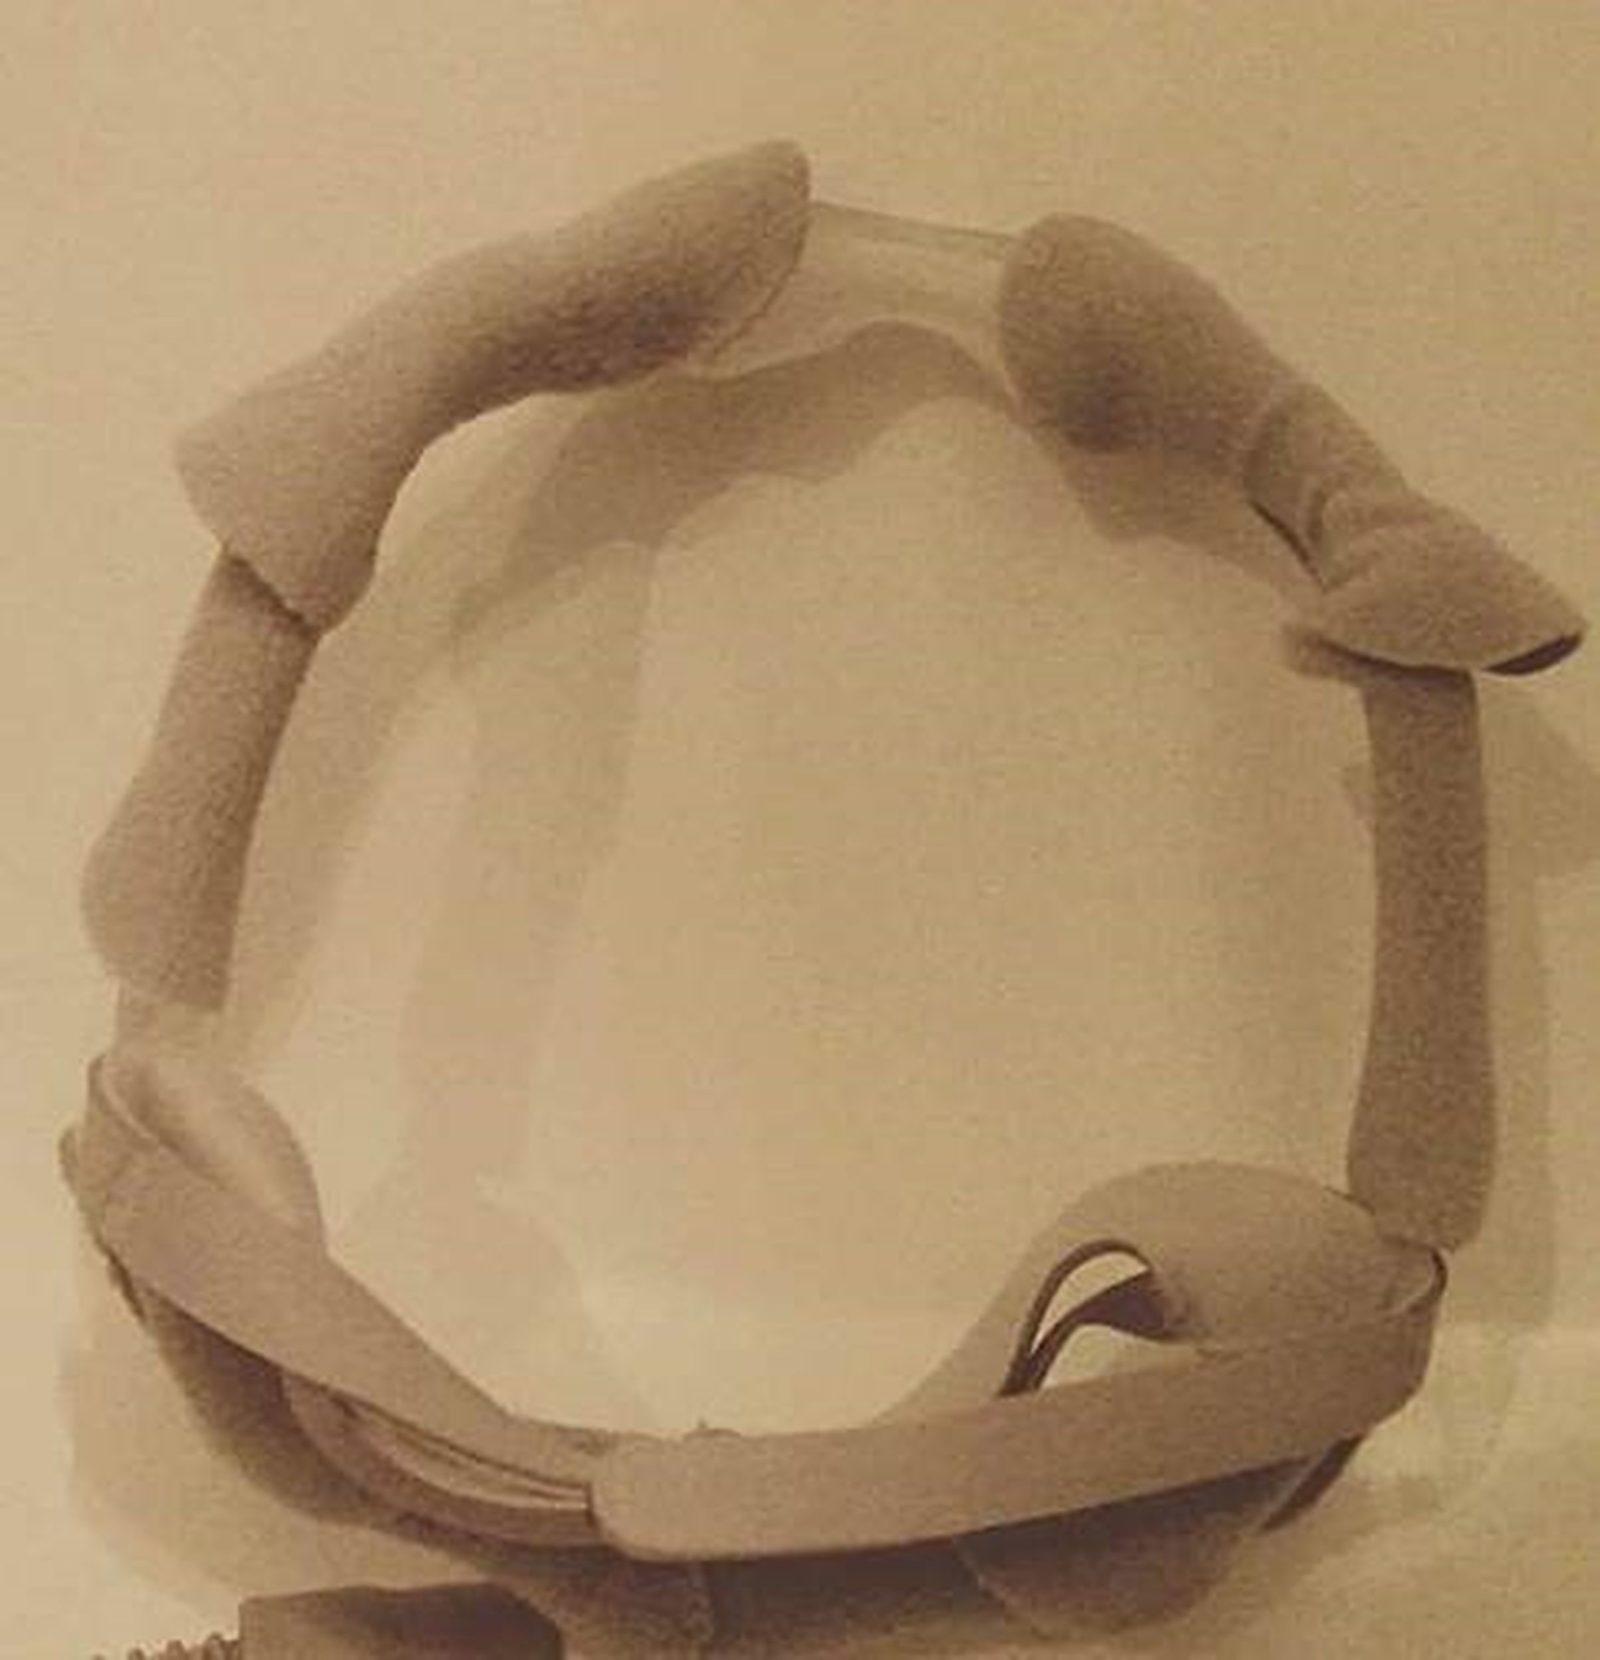 FRANCKHAUSER Chloé - Imperfection 5